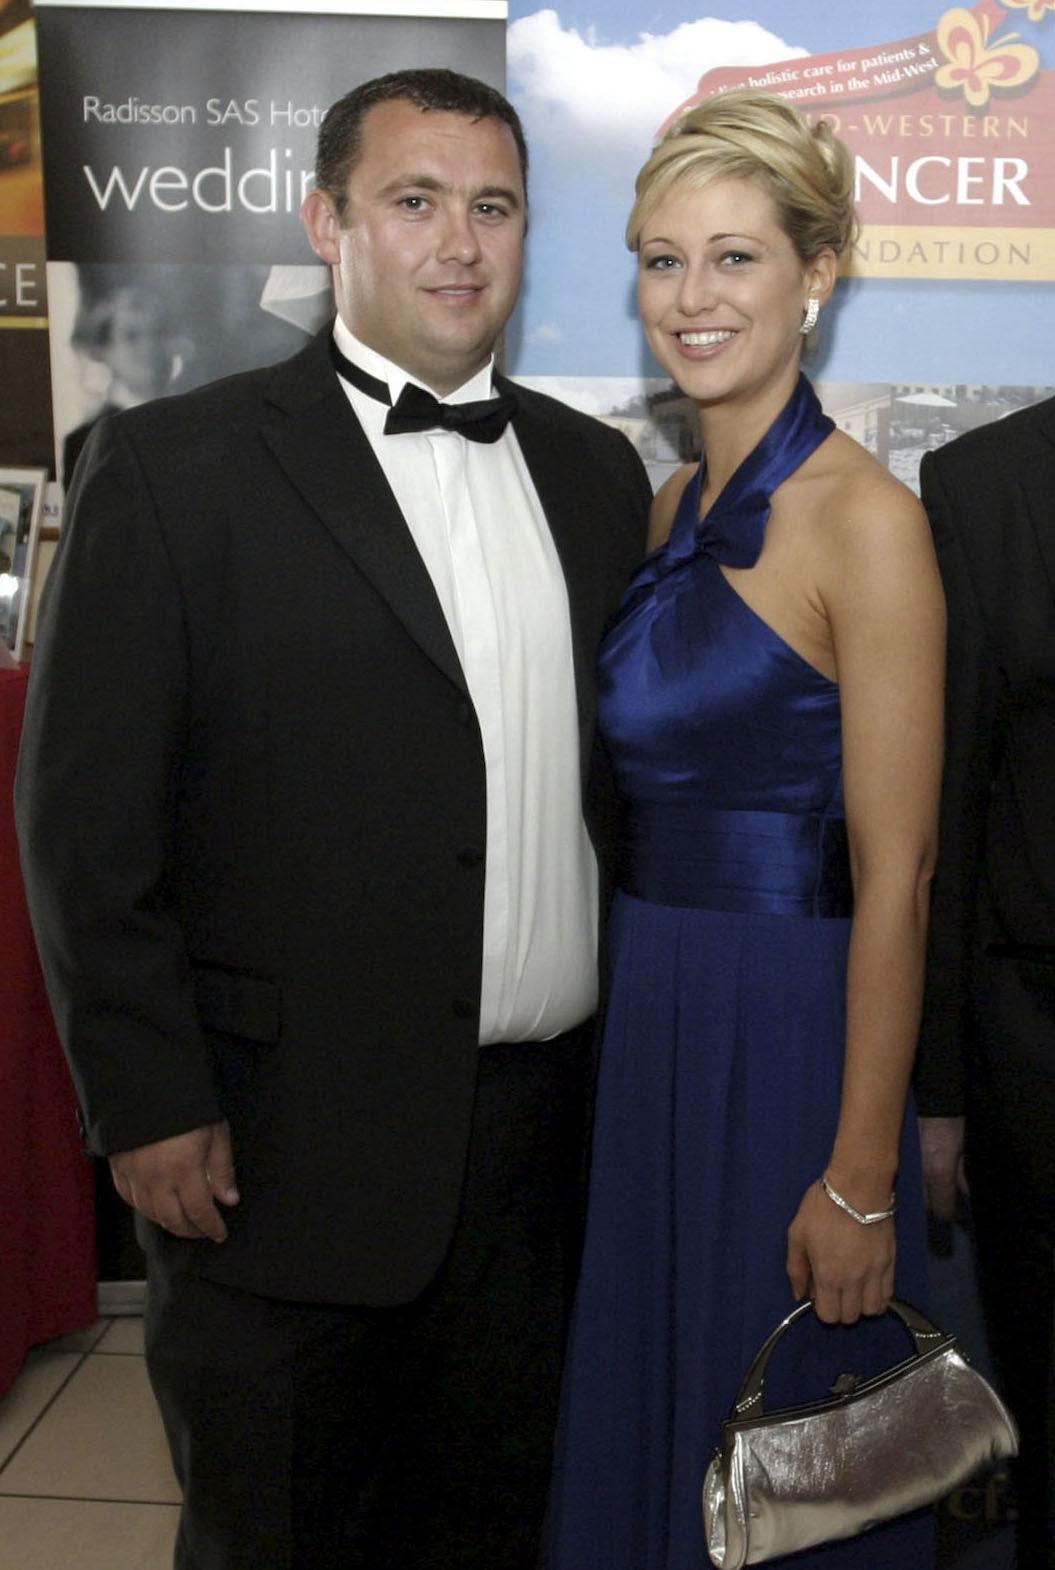 Jason Corbett and Molly Martens Corbett (copy) (copy)